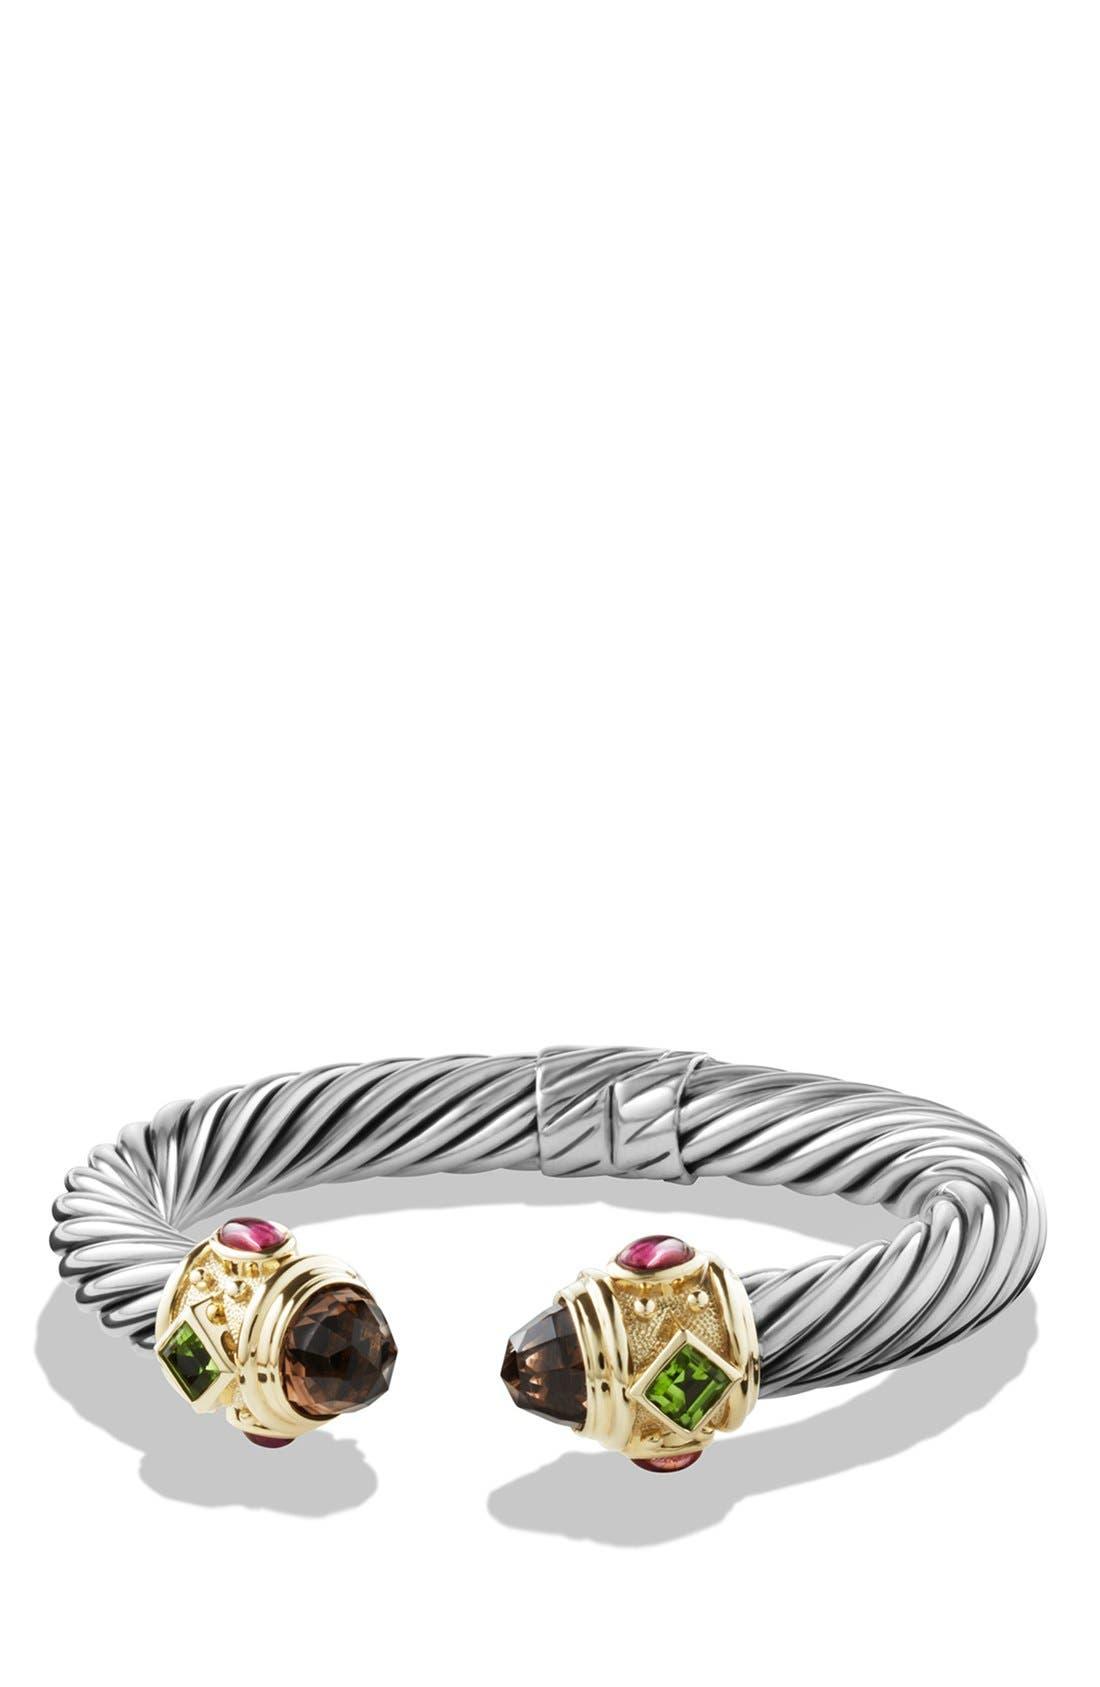 Alternate Image 1 Selected - David Yurman 'Renaissance' Bracelet with Semiprecious Stones & Gold